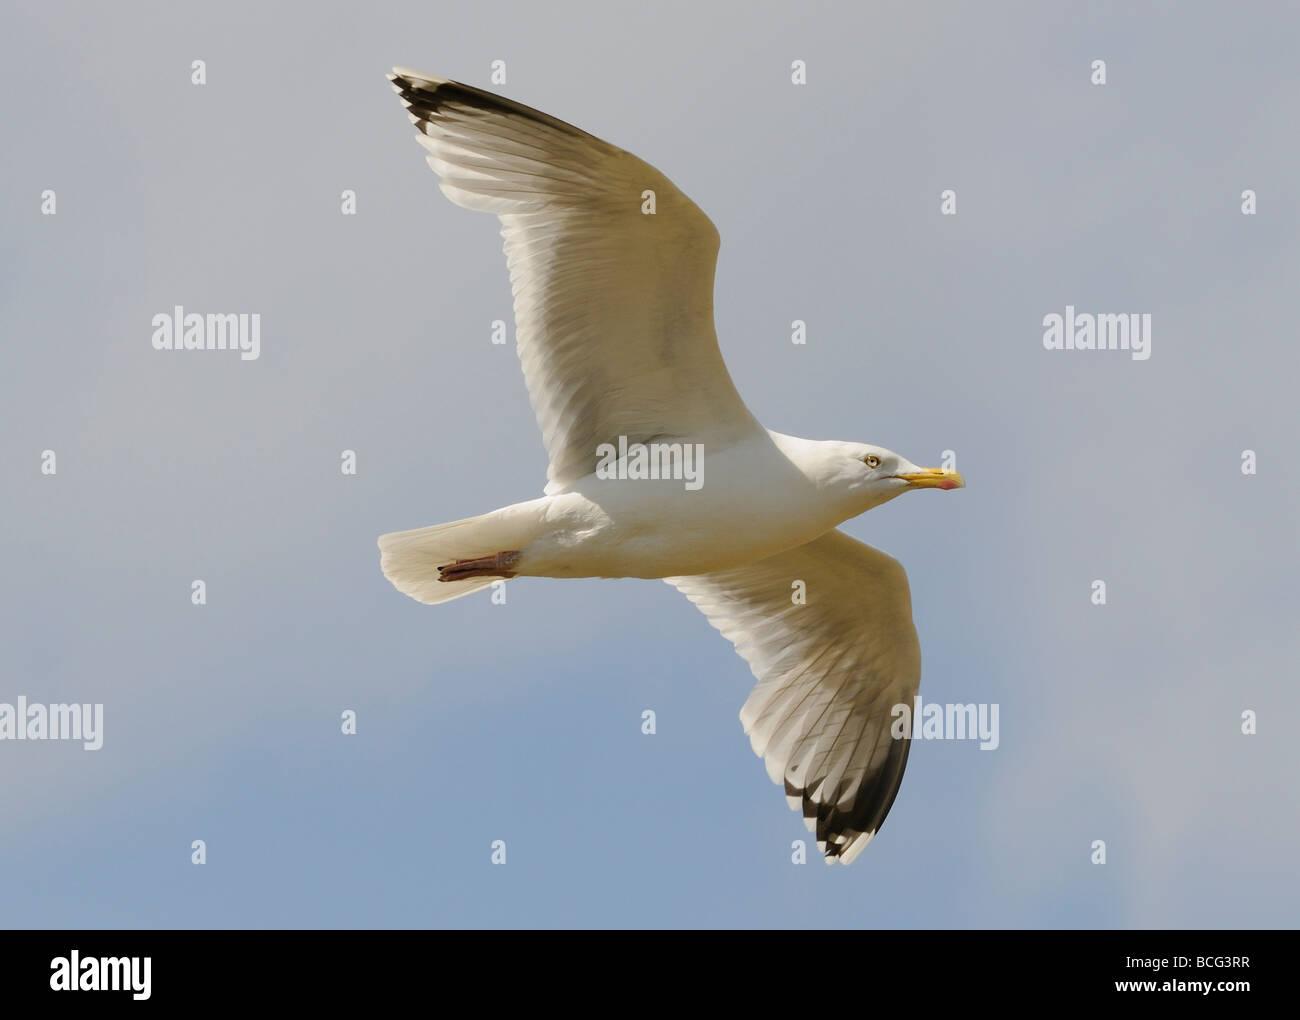 A Herring Gull (Larus argentatus) in flight. Stock Photo